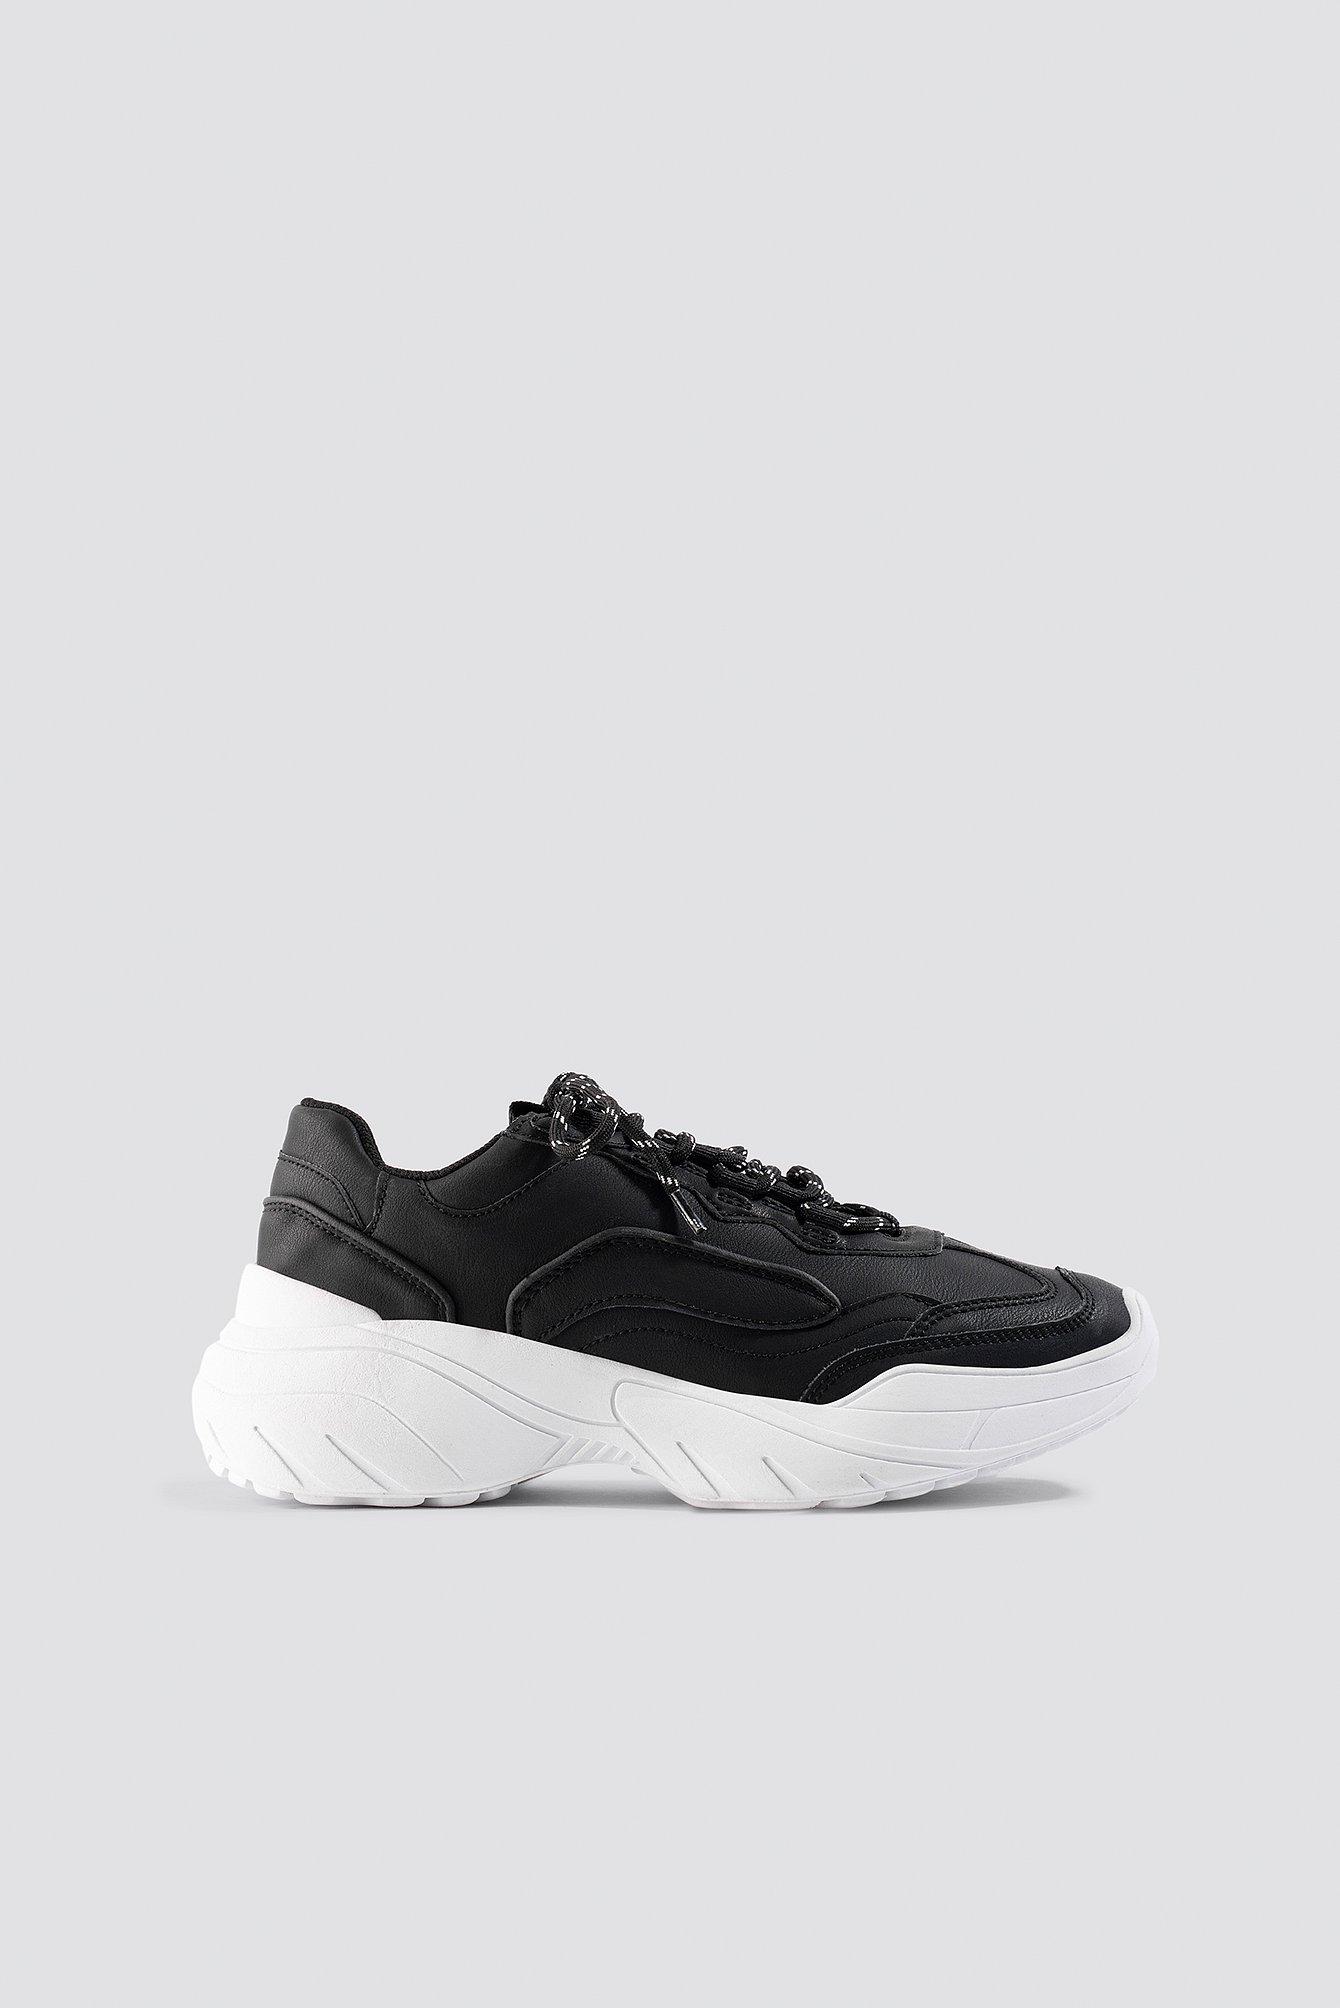 mango -  Colin Sport Shoe - Black